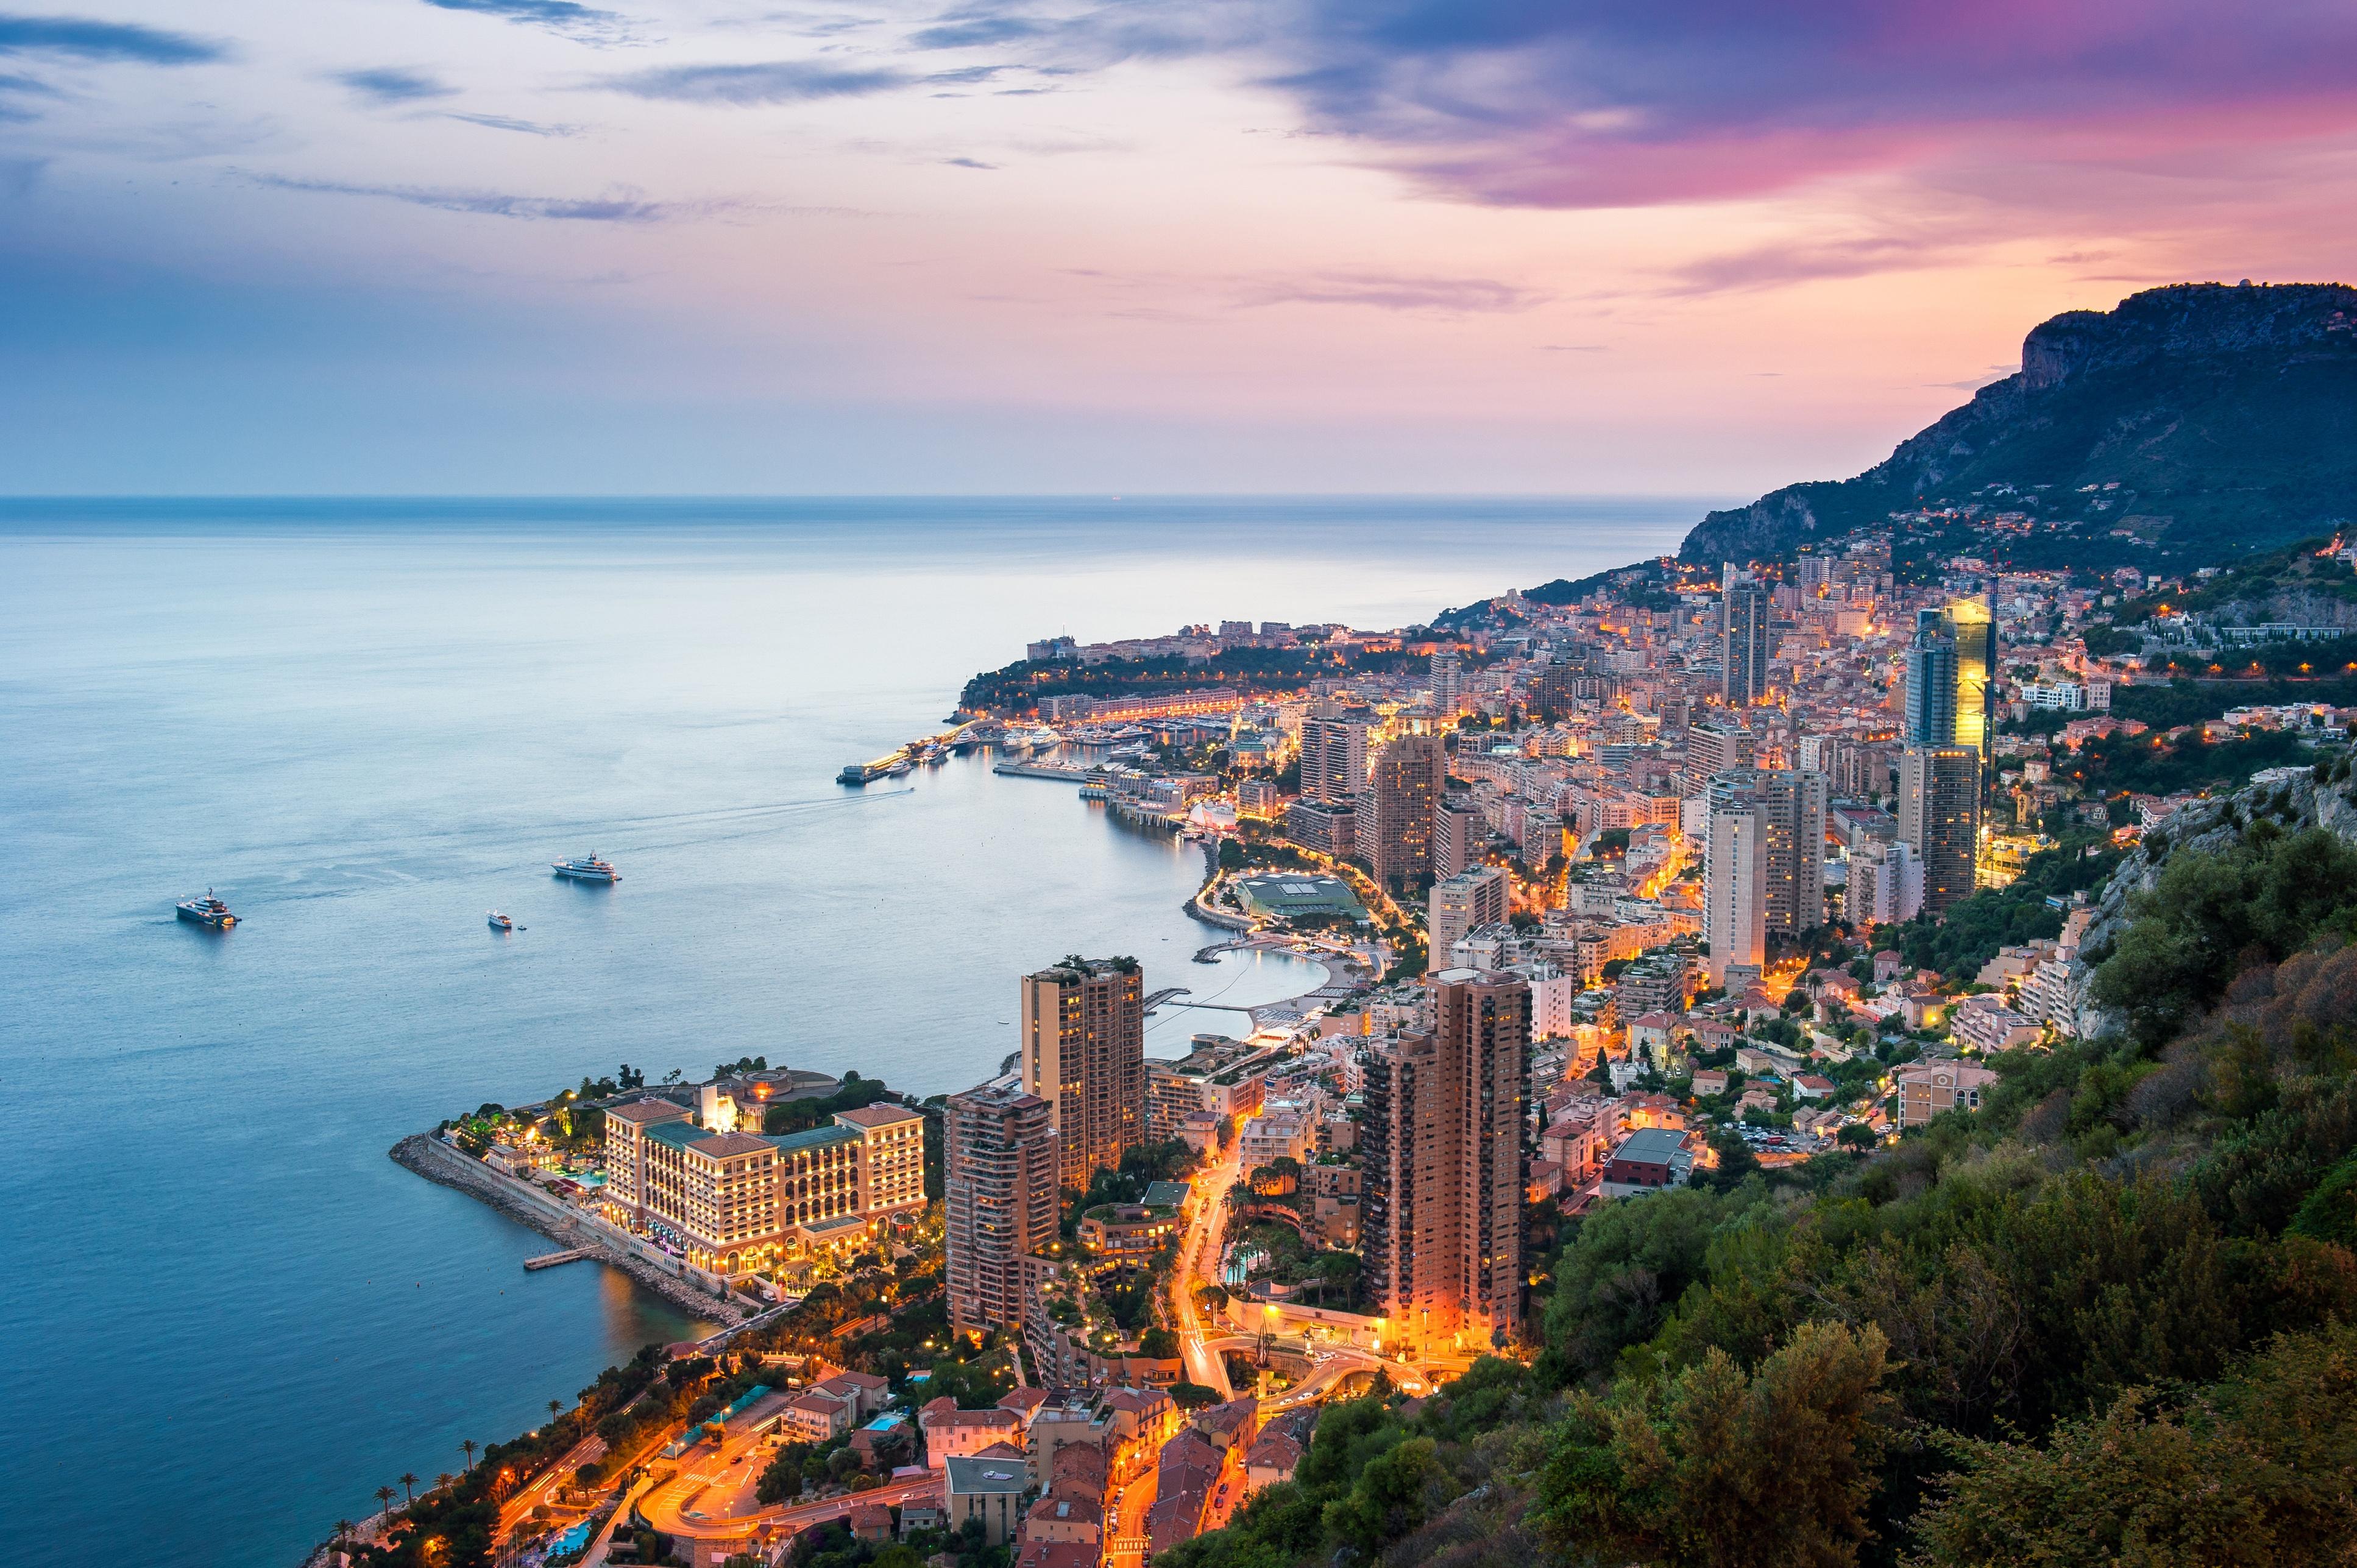 Sunset in Monaco.